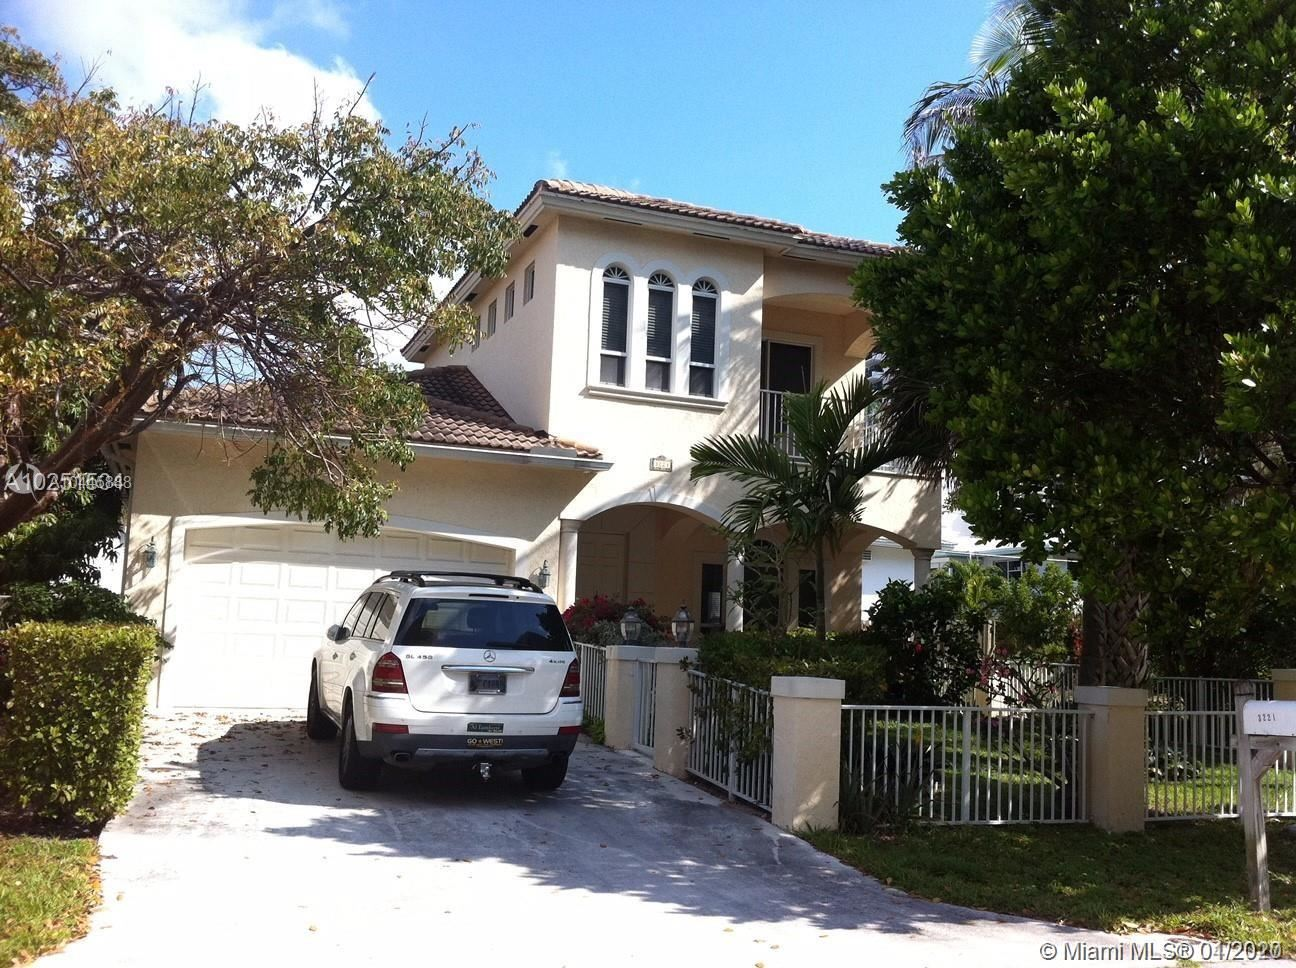 3221 NE 5th St, Pompano Beach, FL 33062 - MLS#: A10445888